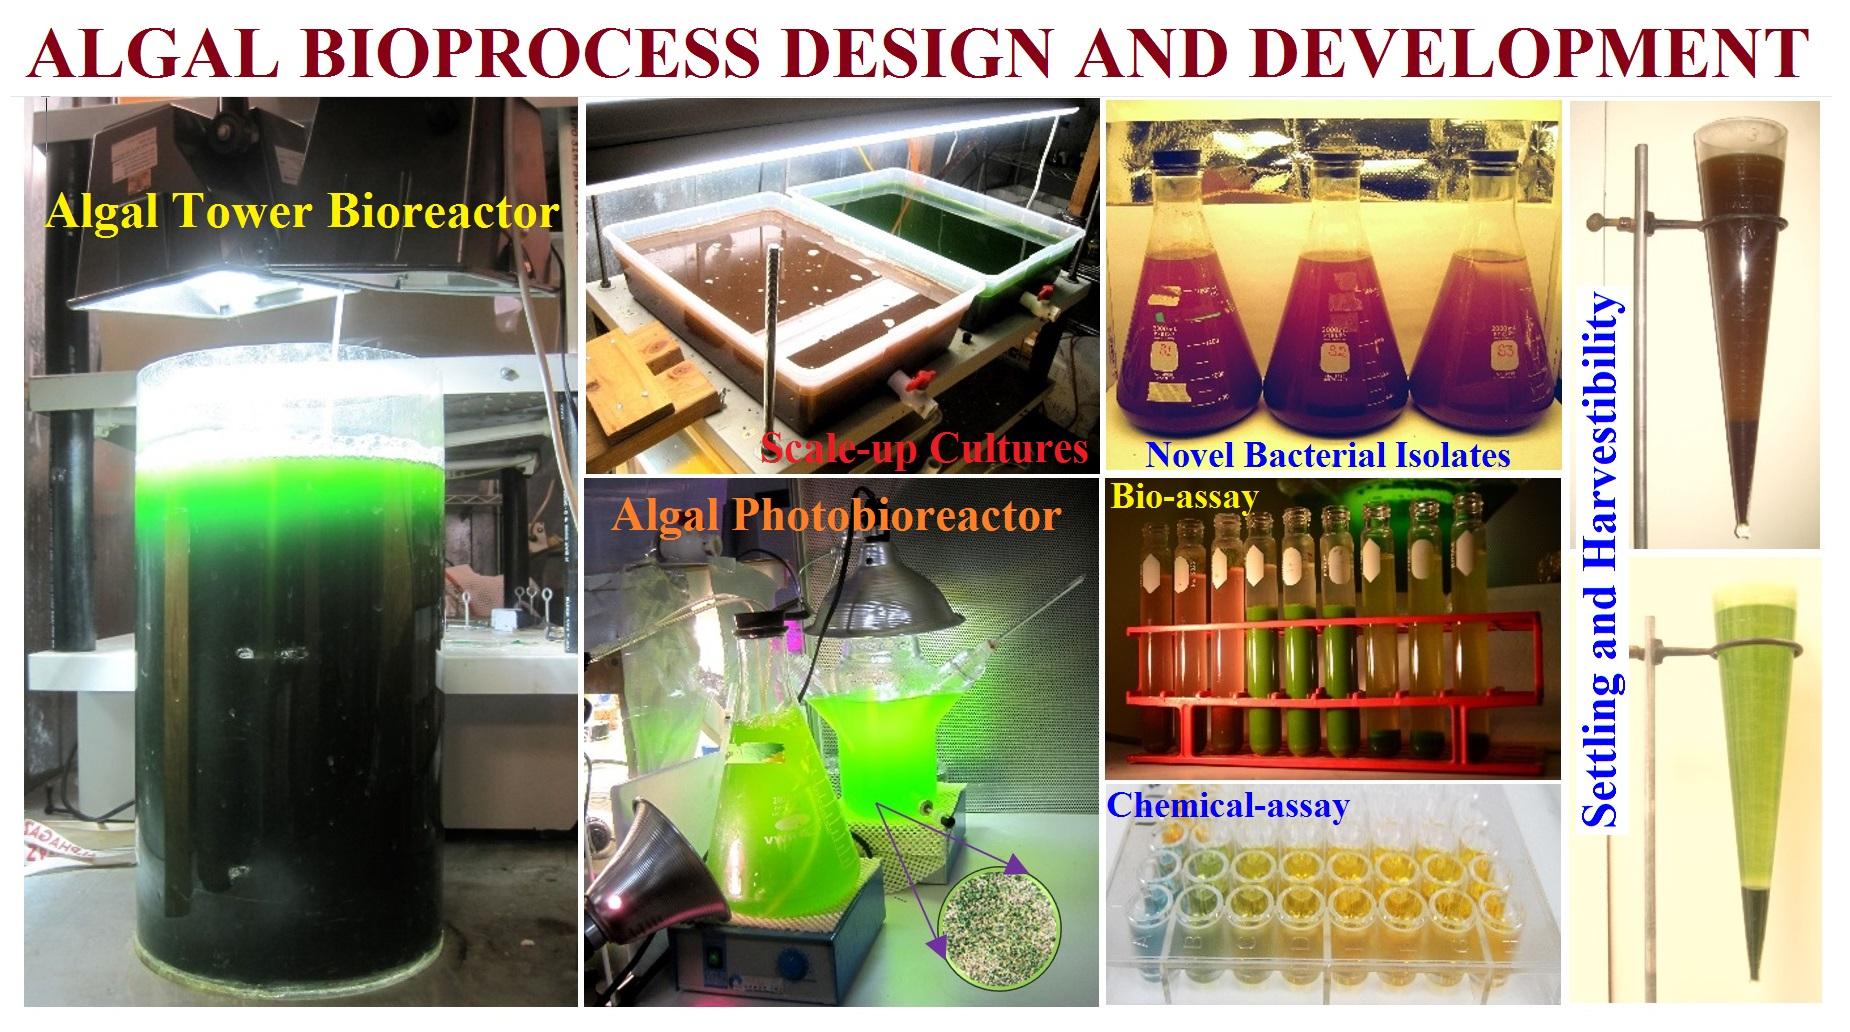 Algal Research @ STL